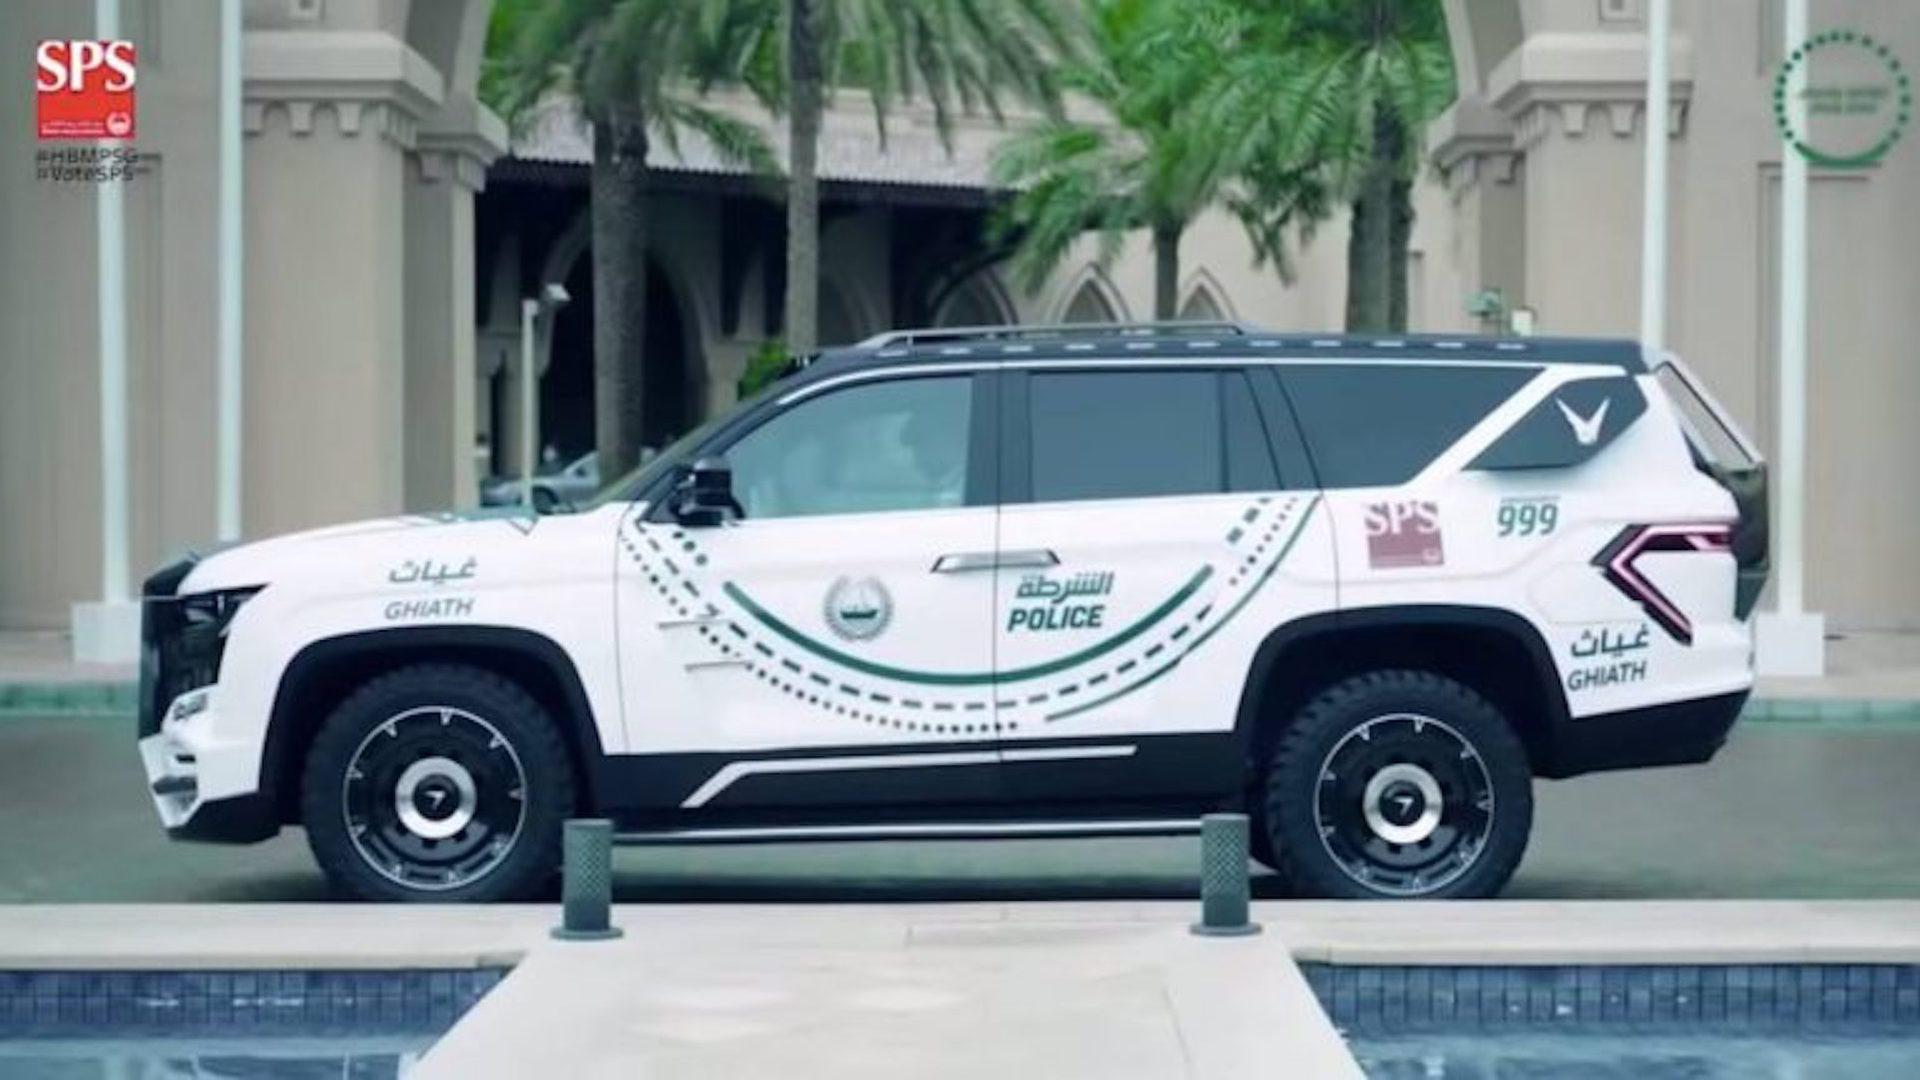 Dubai police Giath Chevy Tahoe-based police car